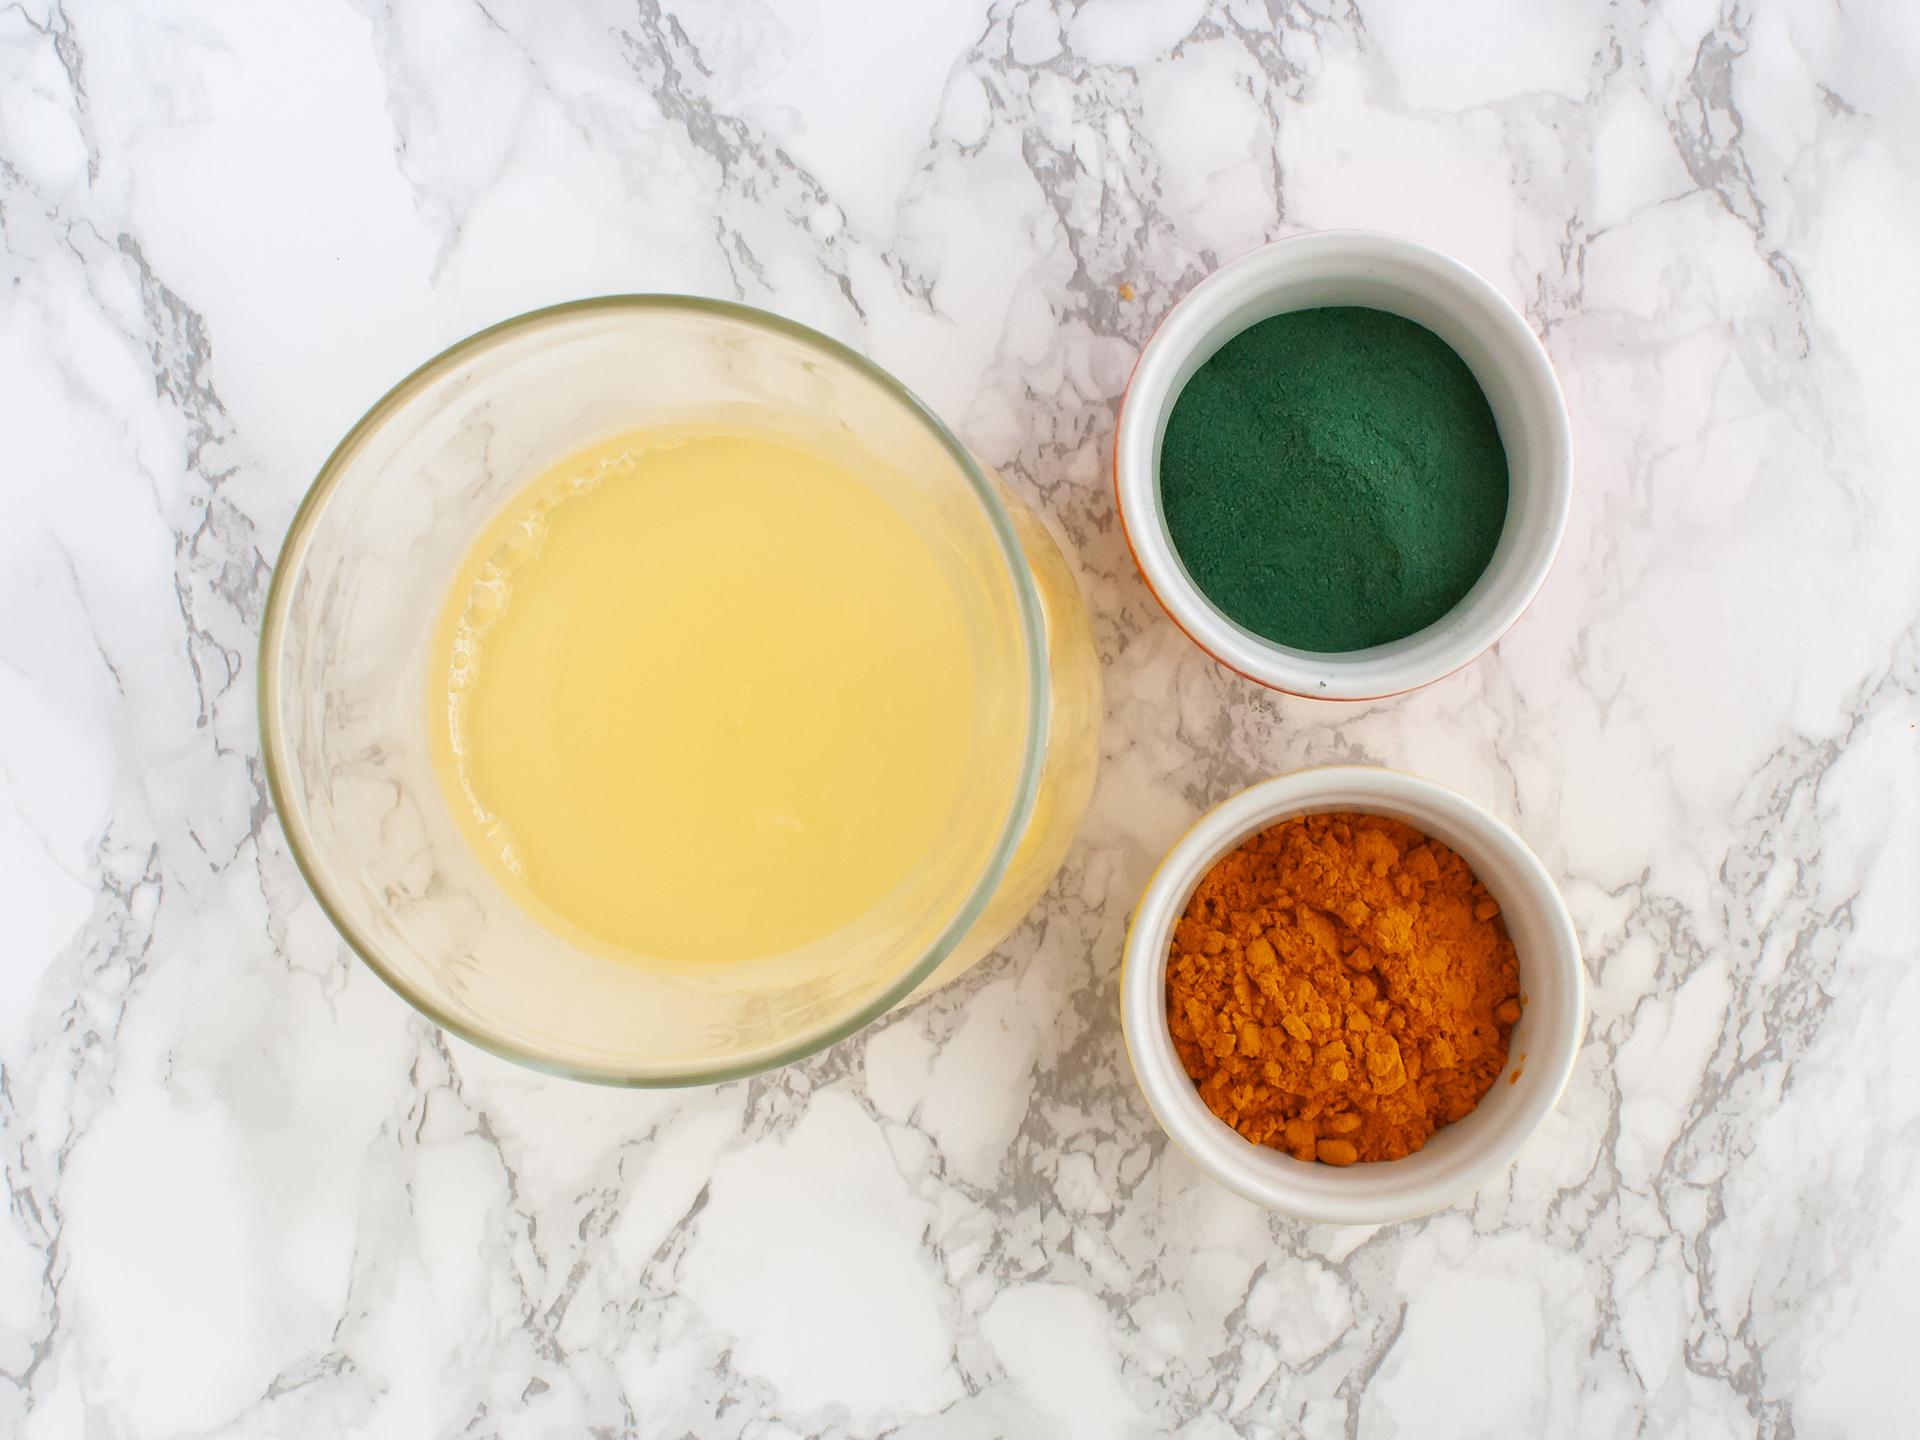 Spirulina, turmeric, and lemonade